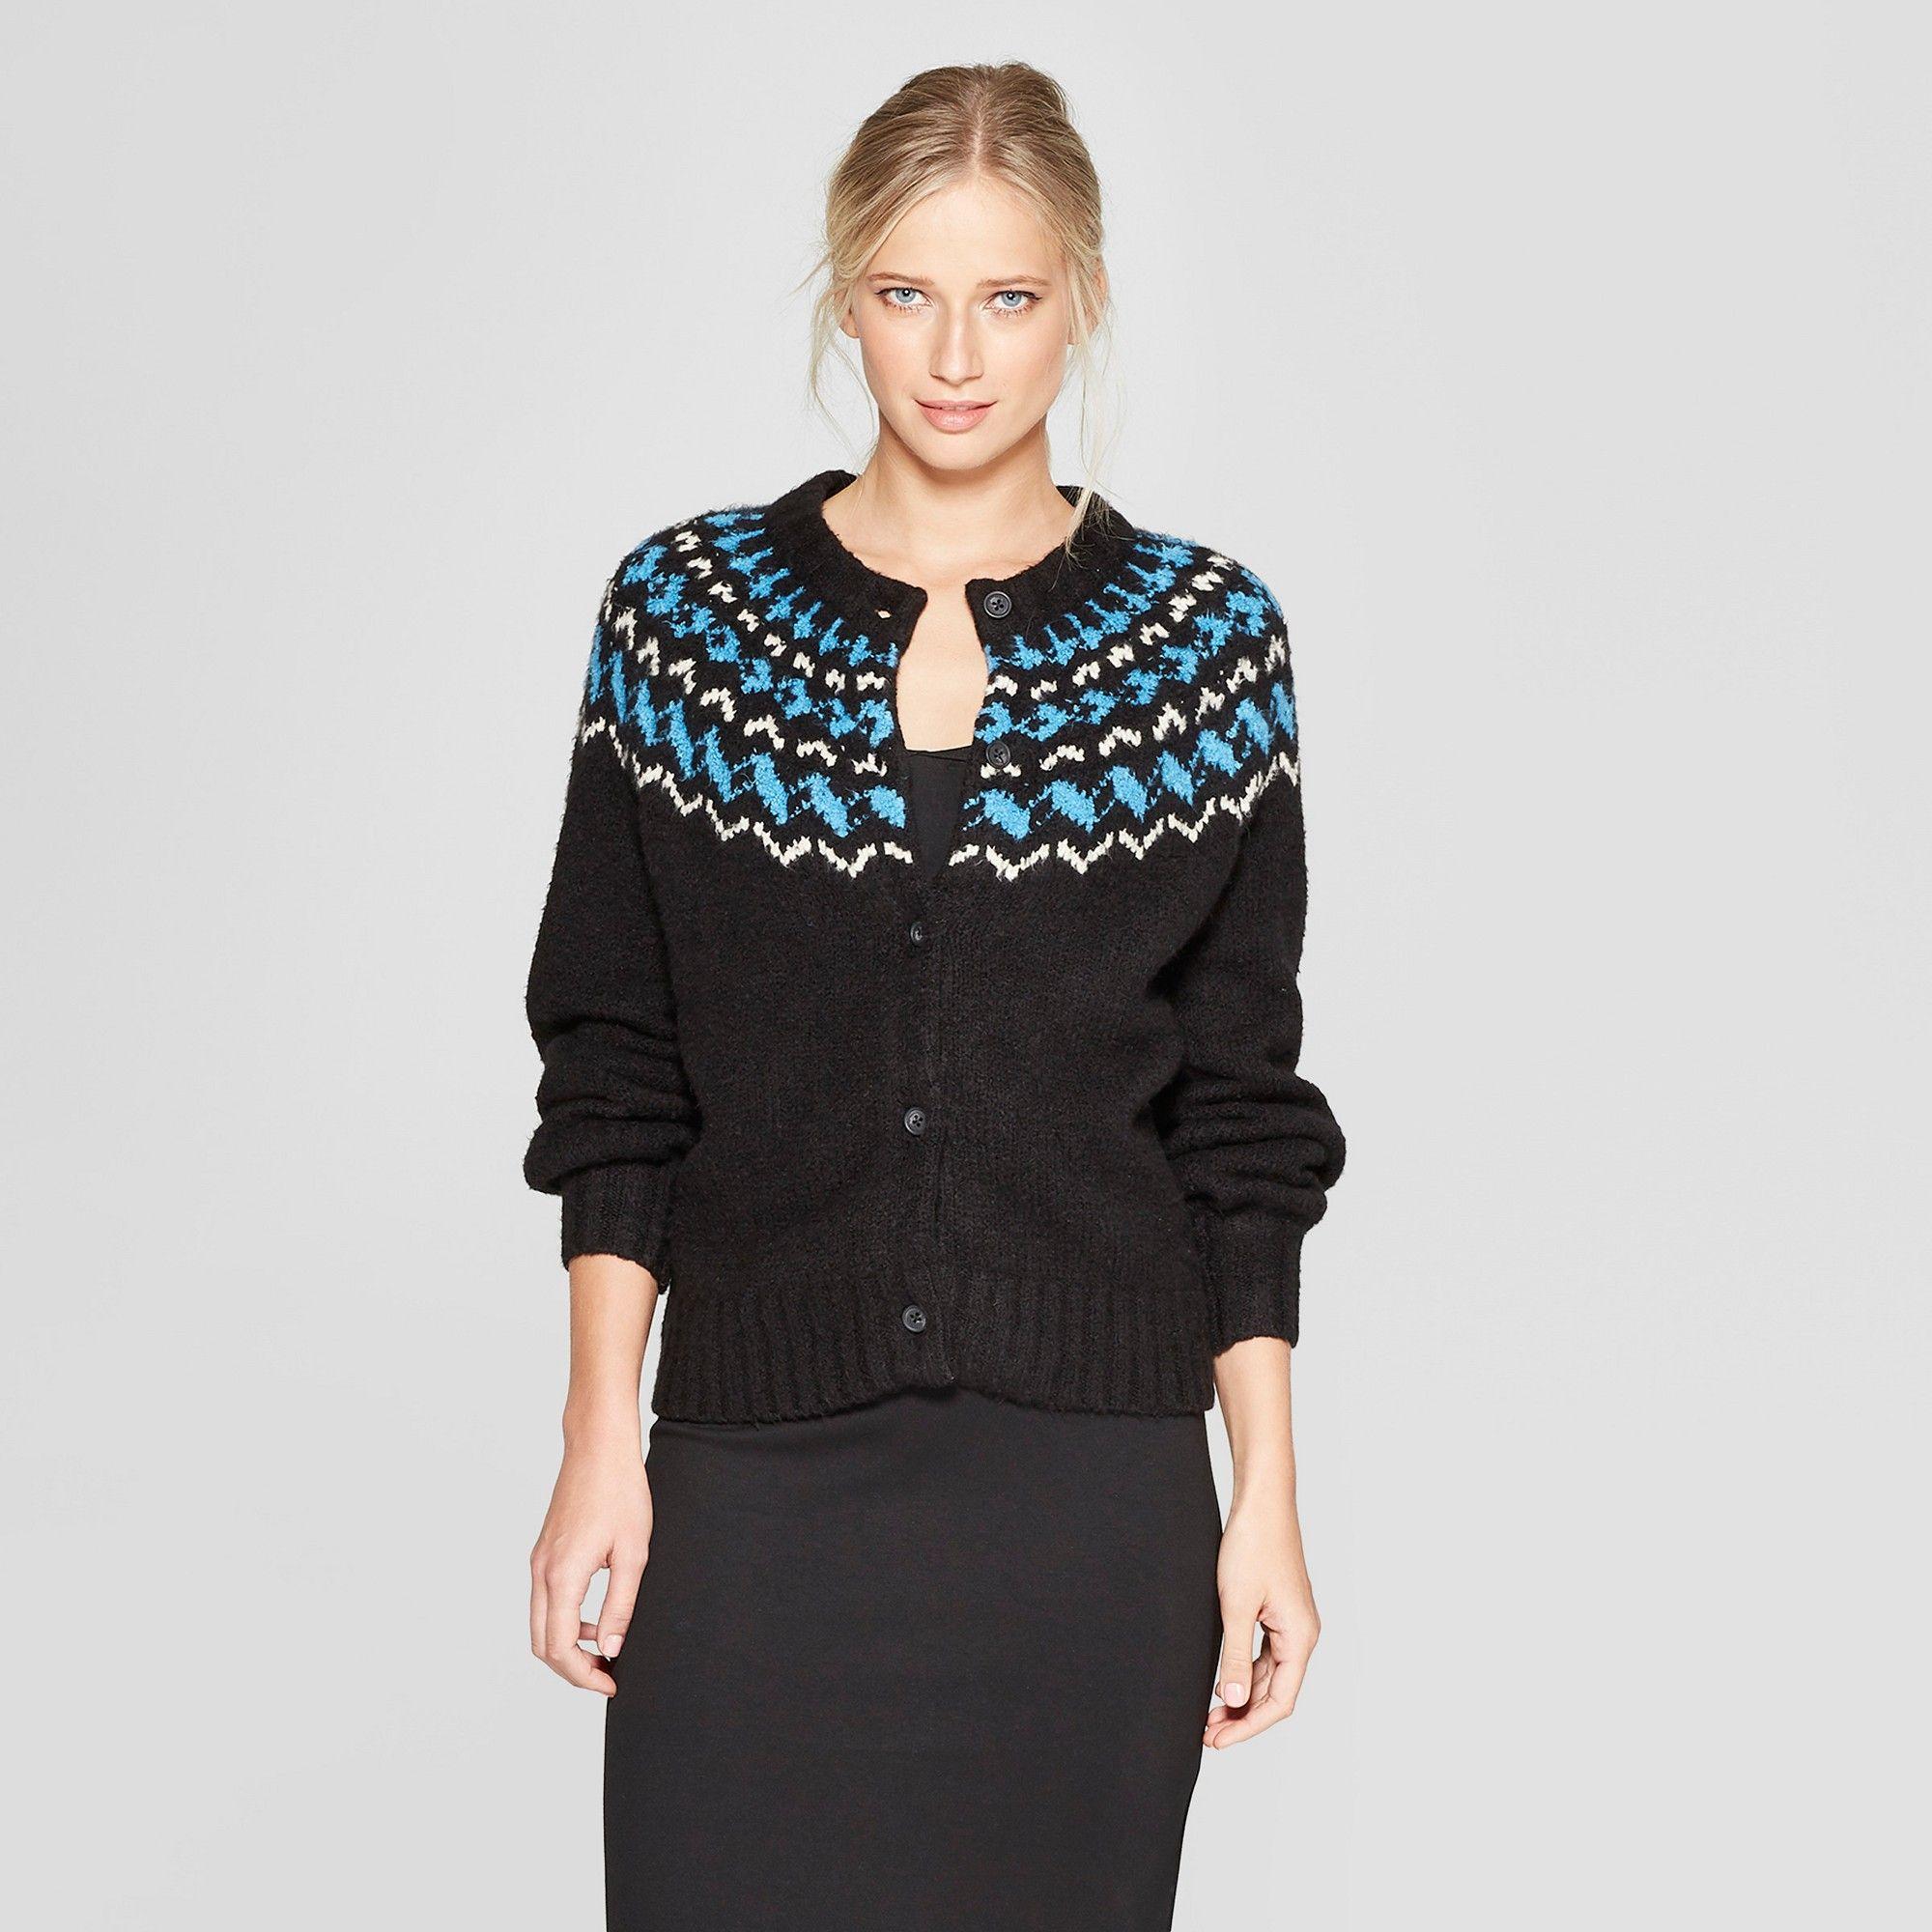 03d861801e3 Women s Long Sleeve Fair Isle Cardigan - Who What Wear Black Xxl ...